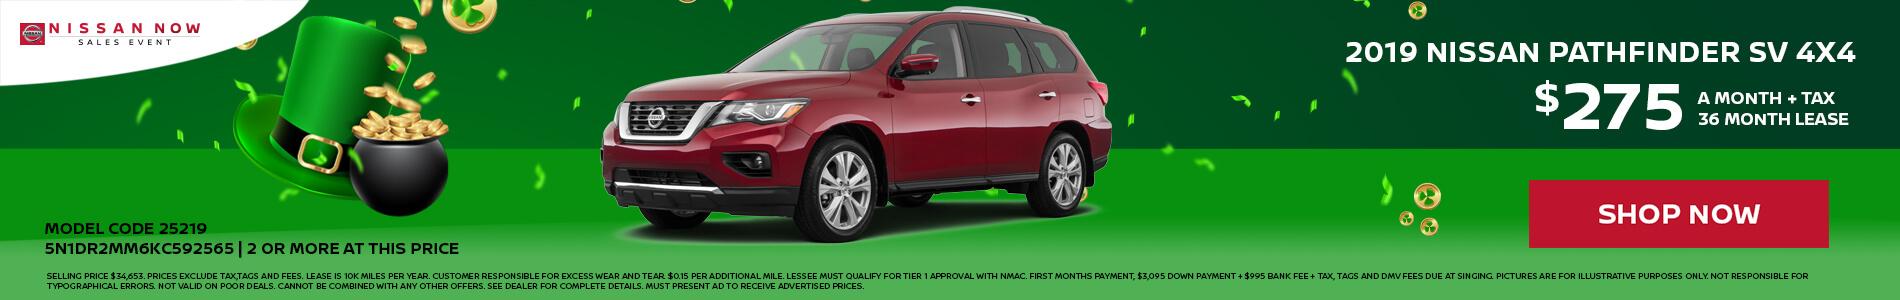 Nissan Pathfinder $275 Lease